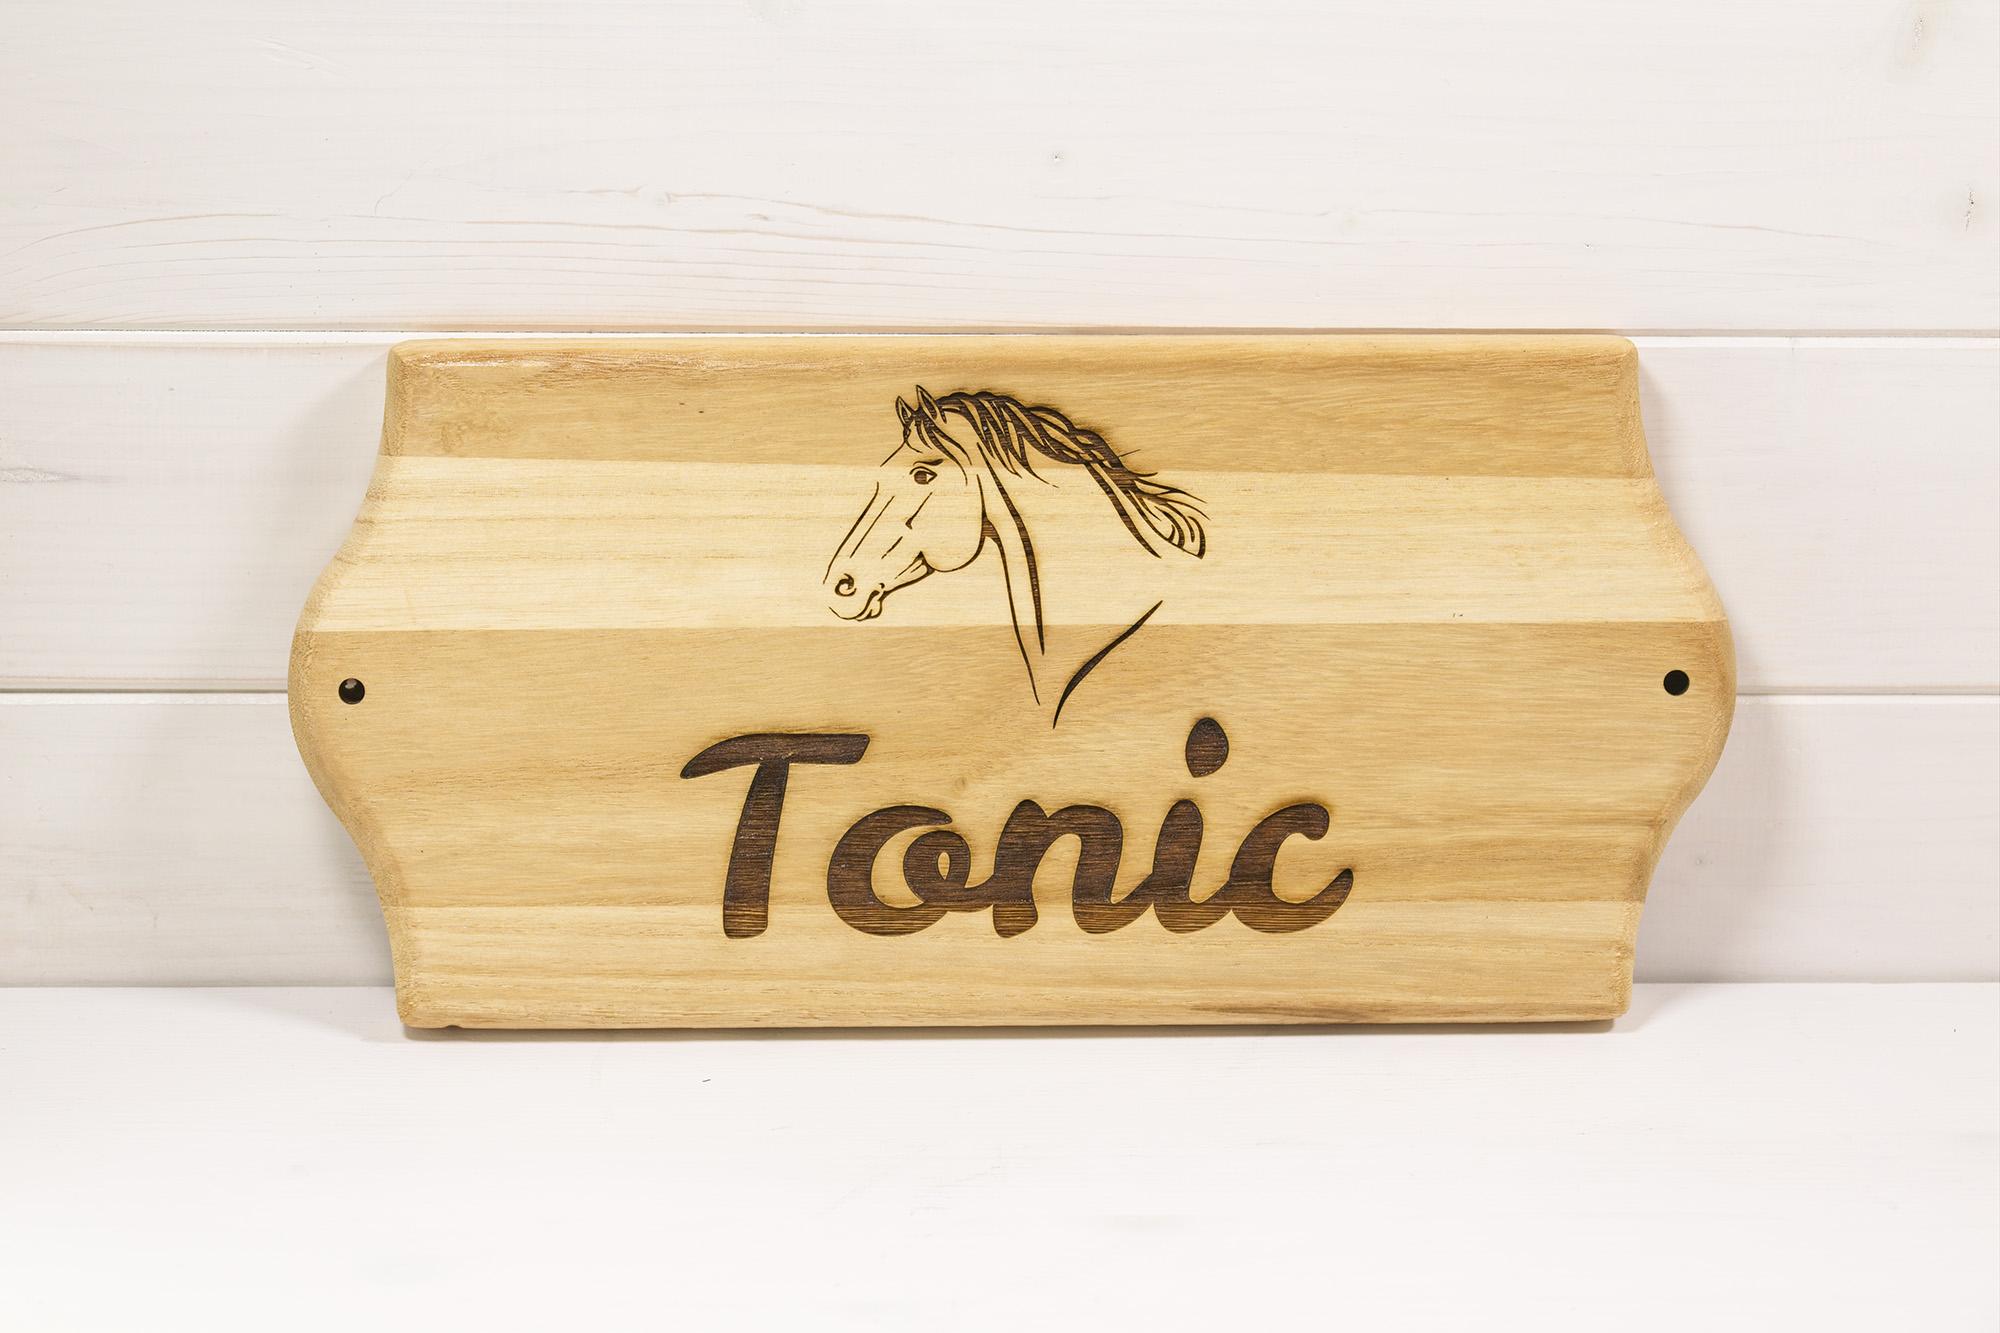 Targa Box Cavallo Tonic